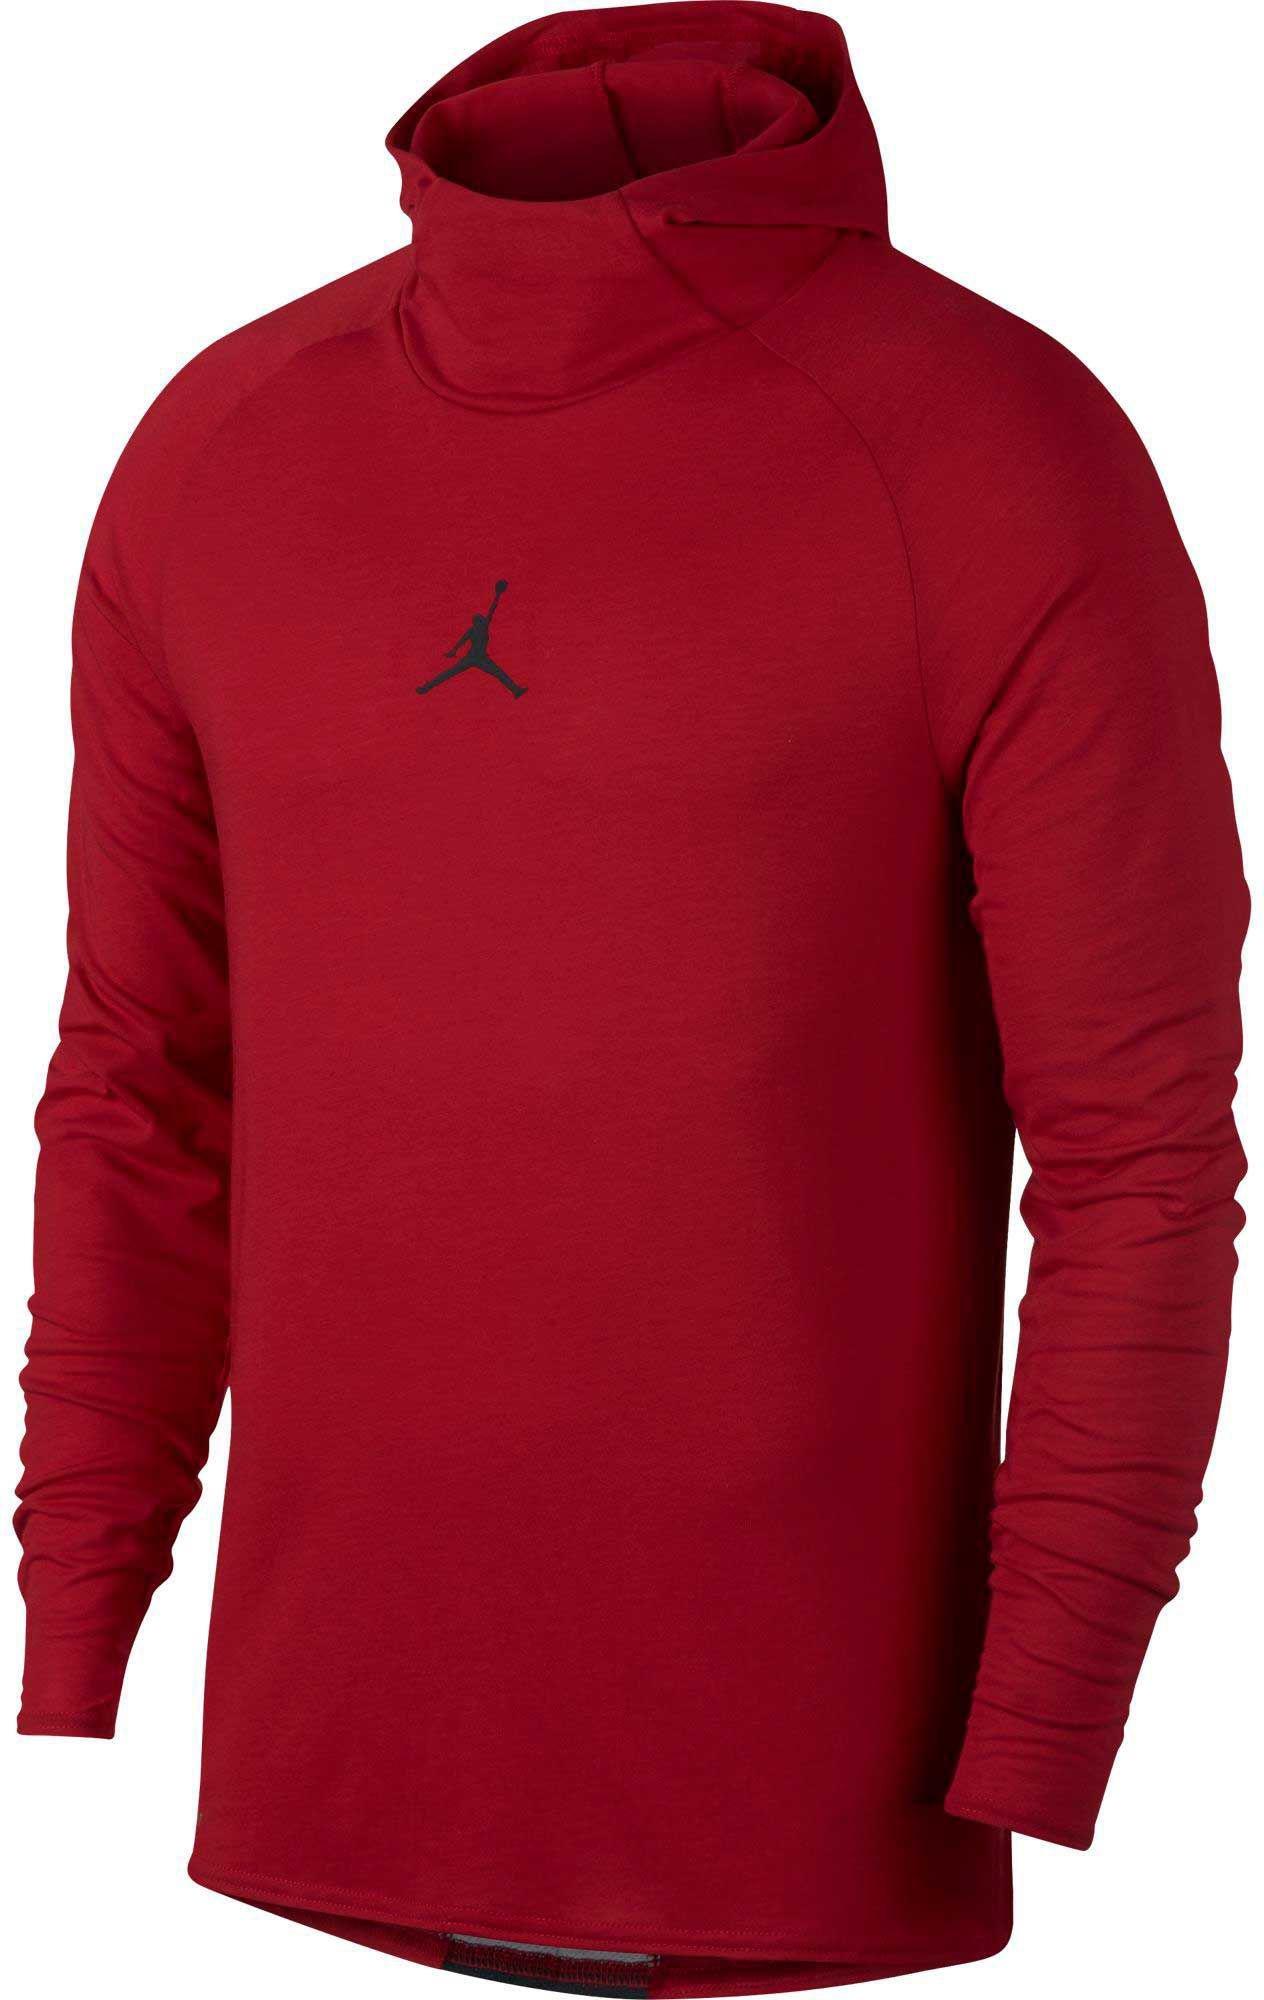 2985d217 Nike Dry 23 Alpha Training Hooded Long Sleeve Shirt in Red for Men ...